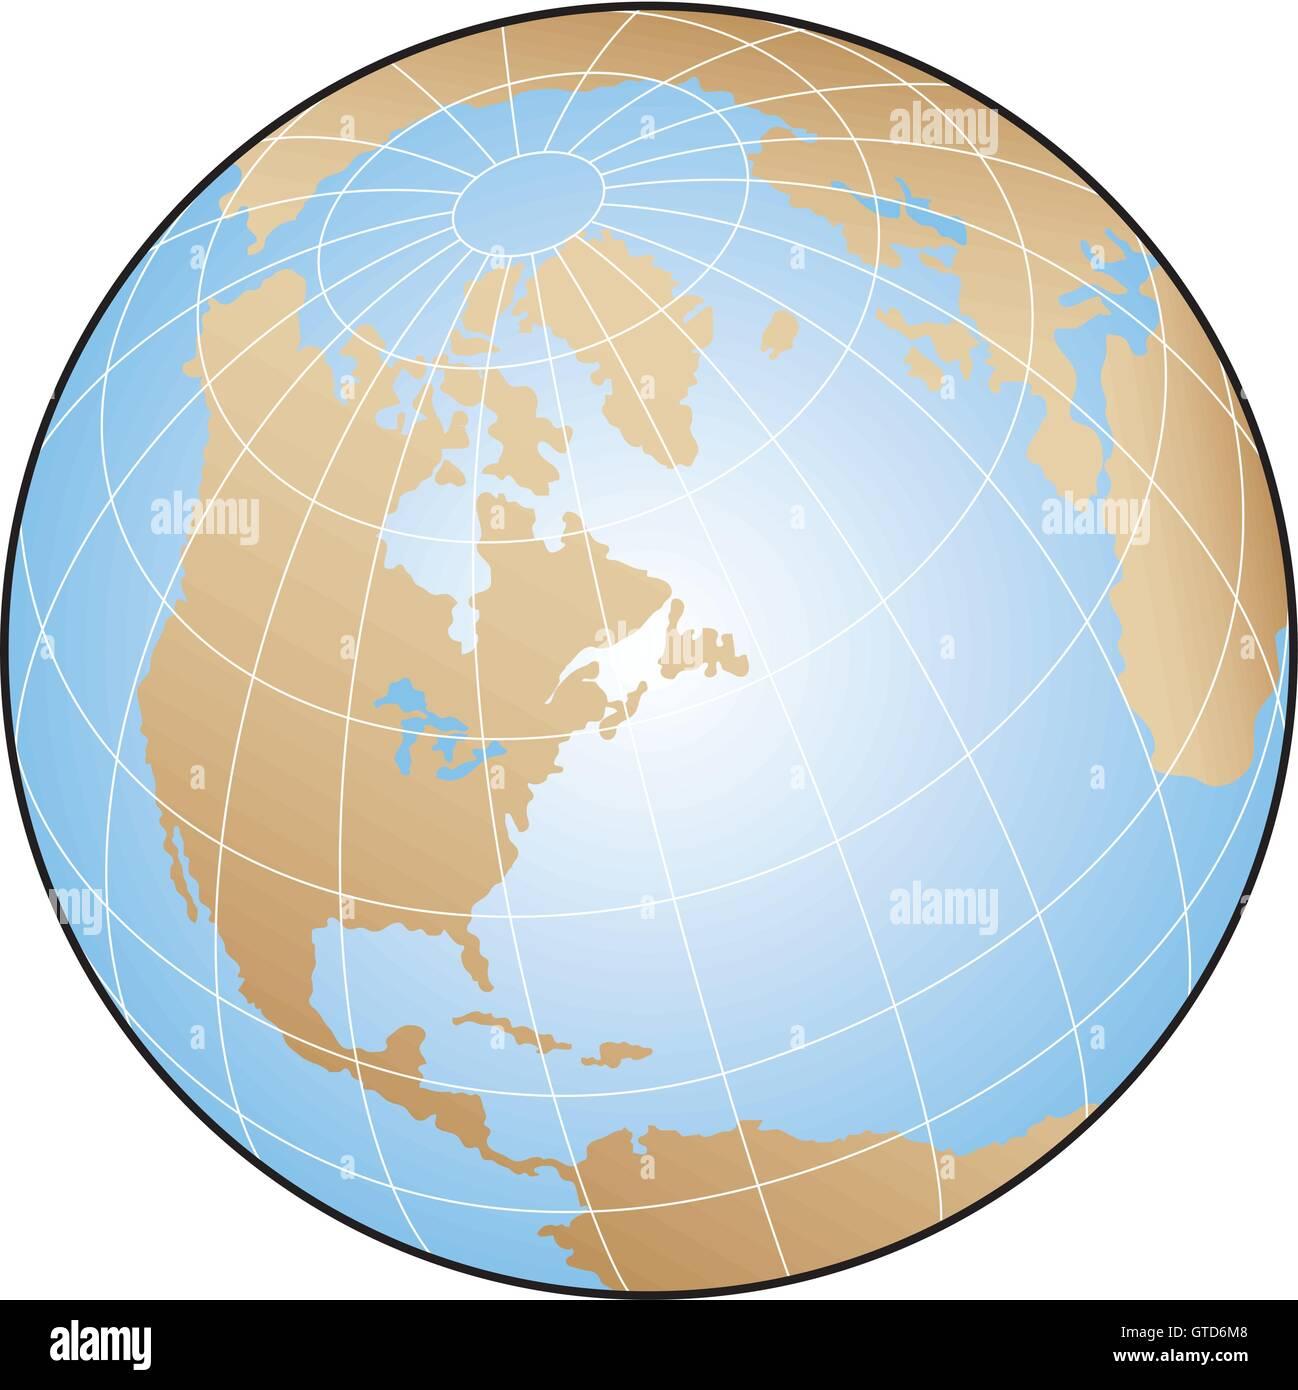 World Map Longitude Latitude Lines Stock Vector Images - Alamy